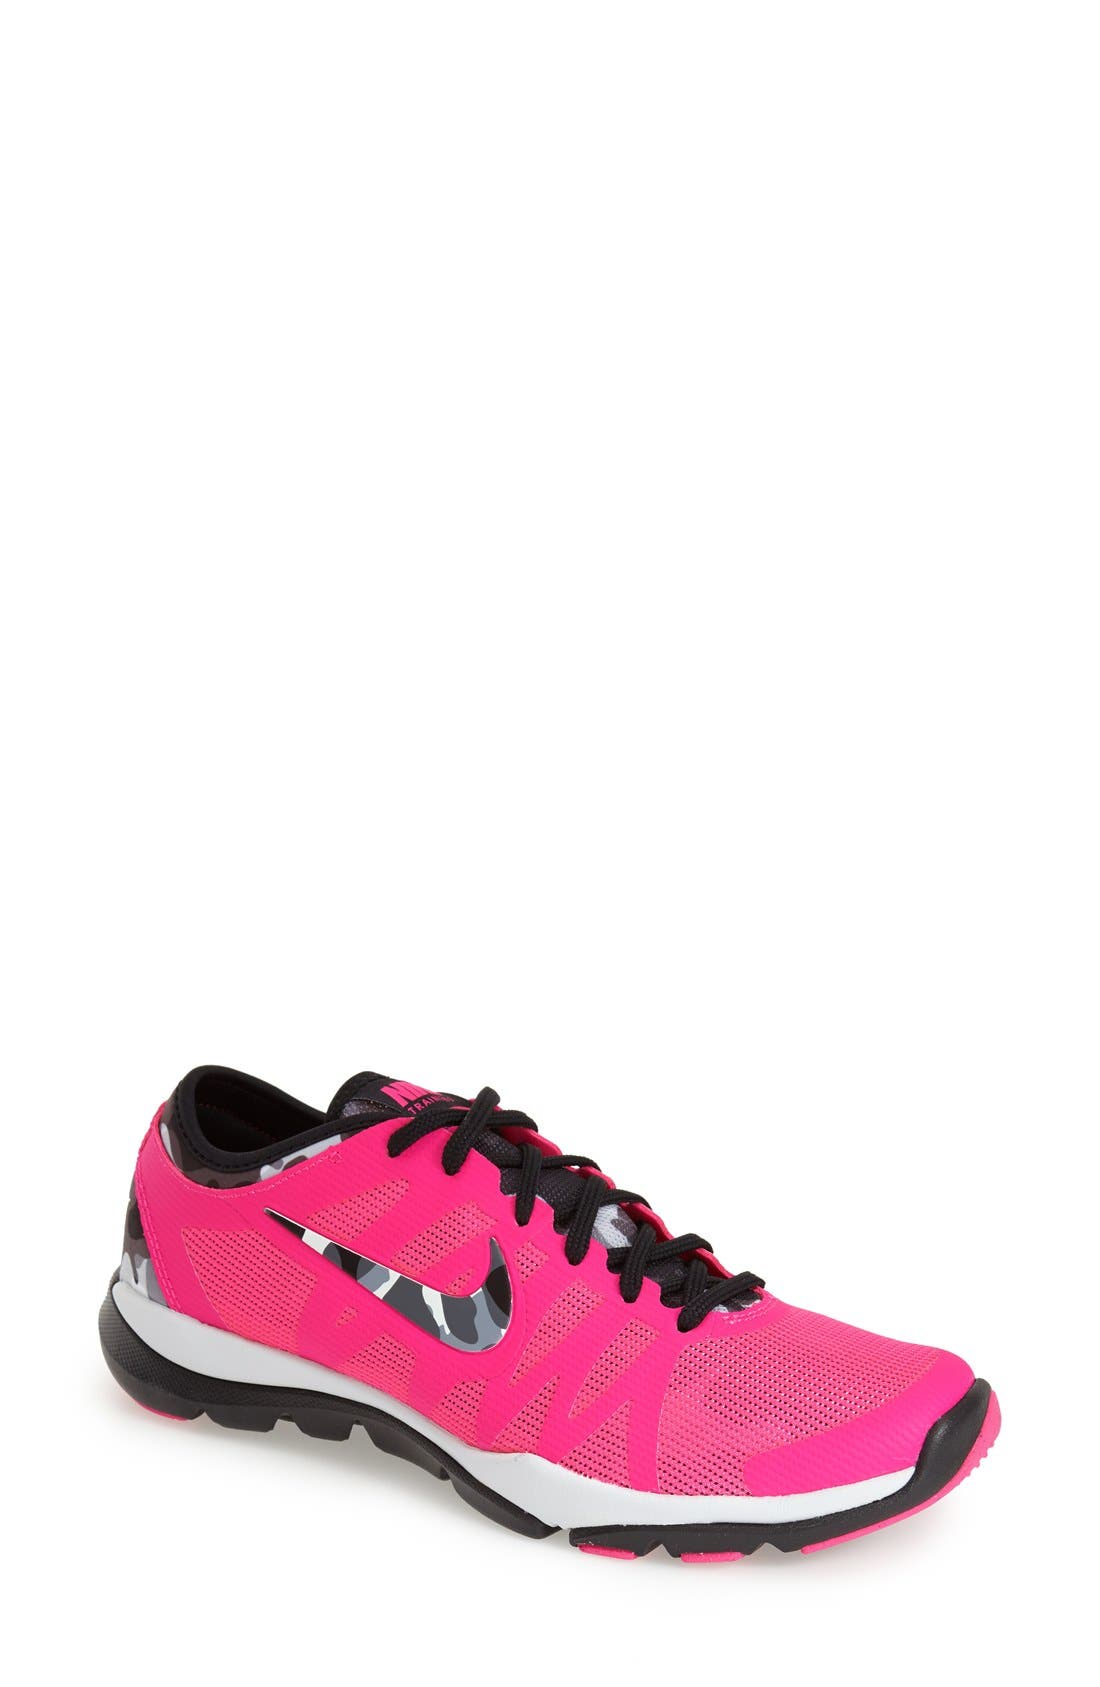 Alternate Image 1 Selected - Nike 'Flex Supreme TR 3' Training Shoe (Women)